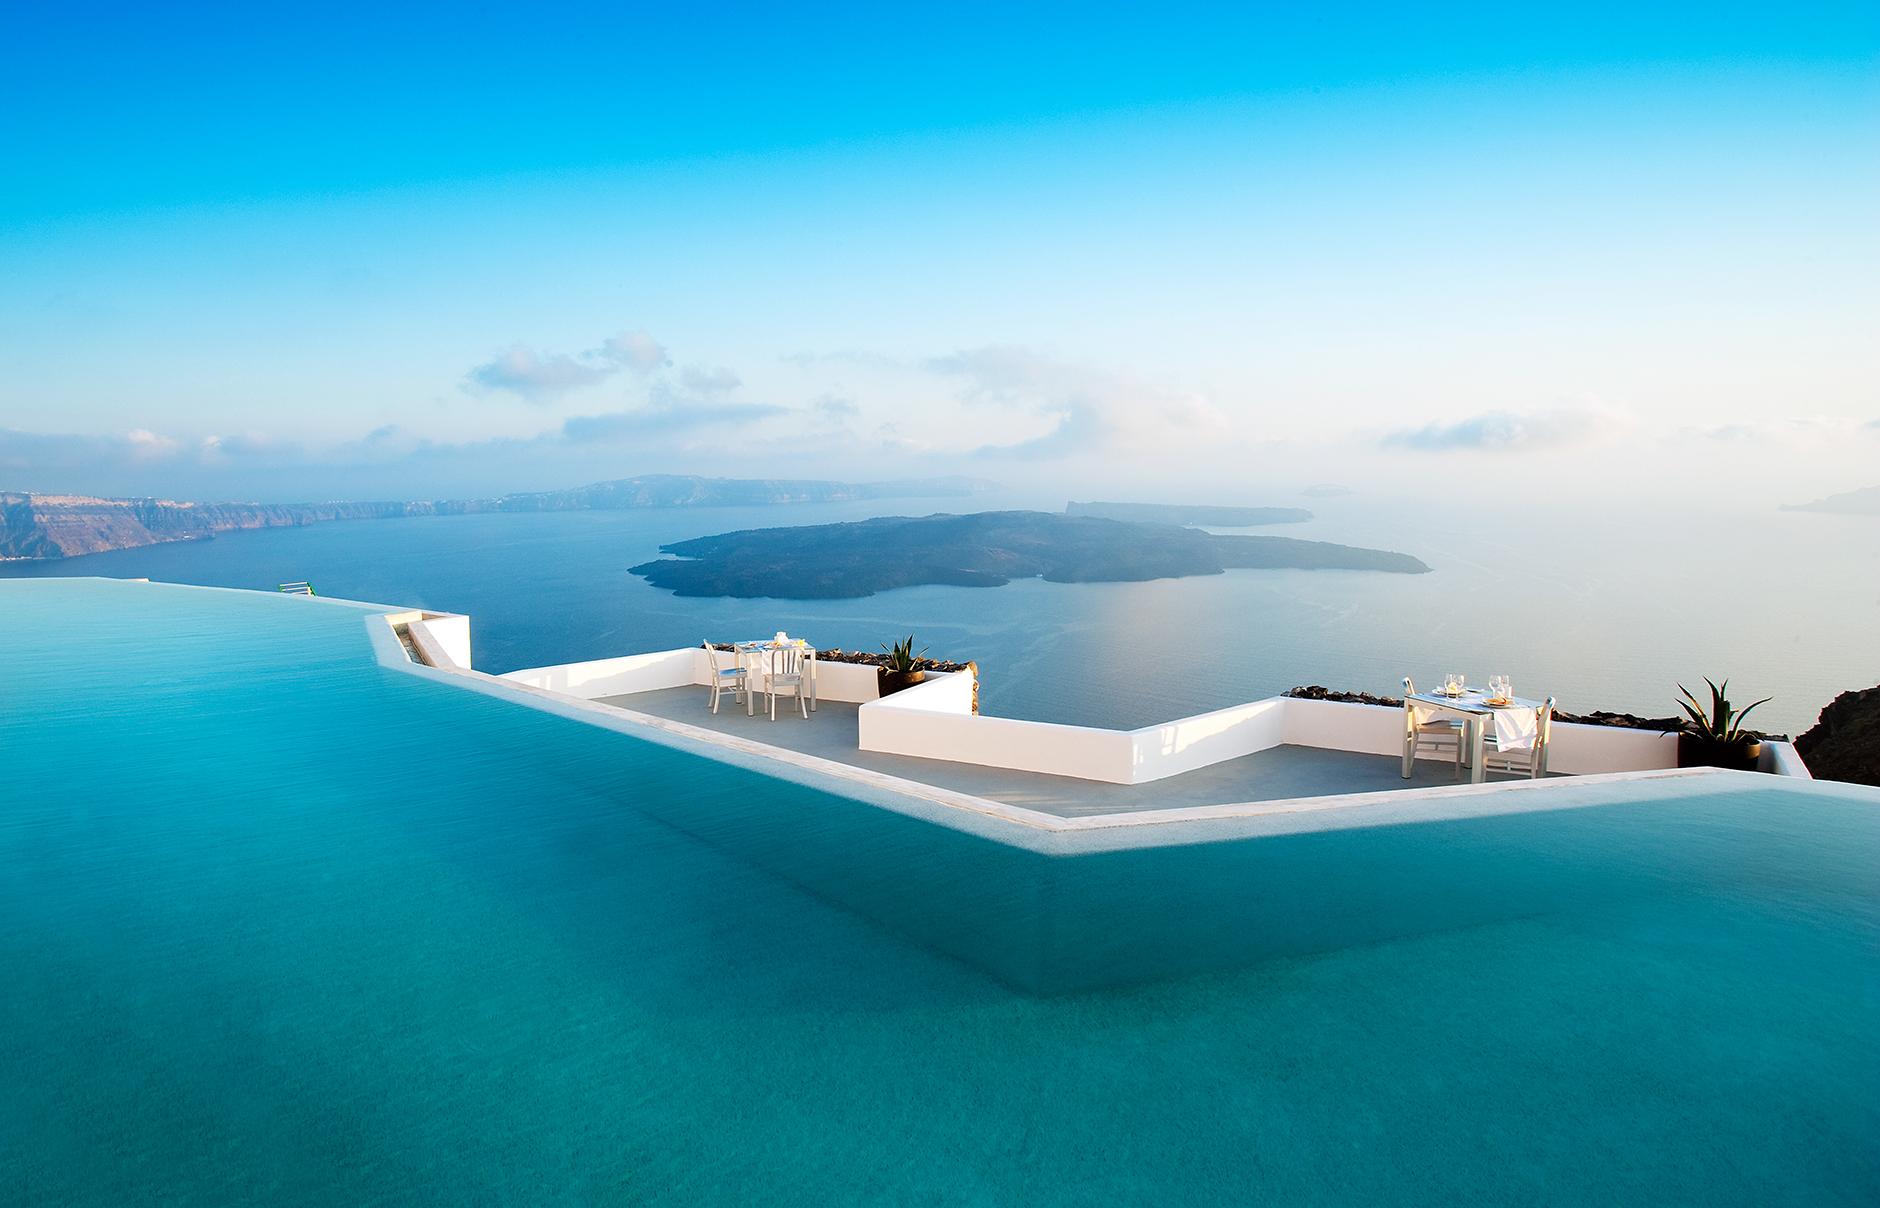 Top 10 Cliff Edge Santorini Hotels Design Buffs Will Love